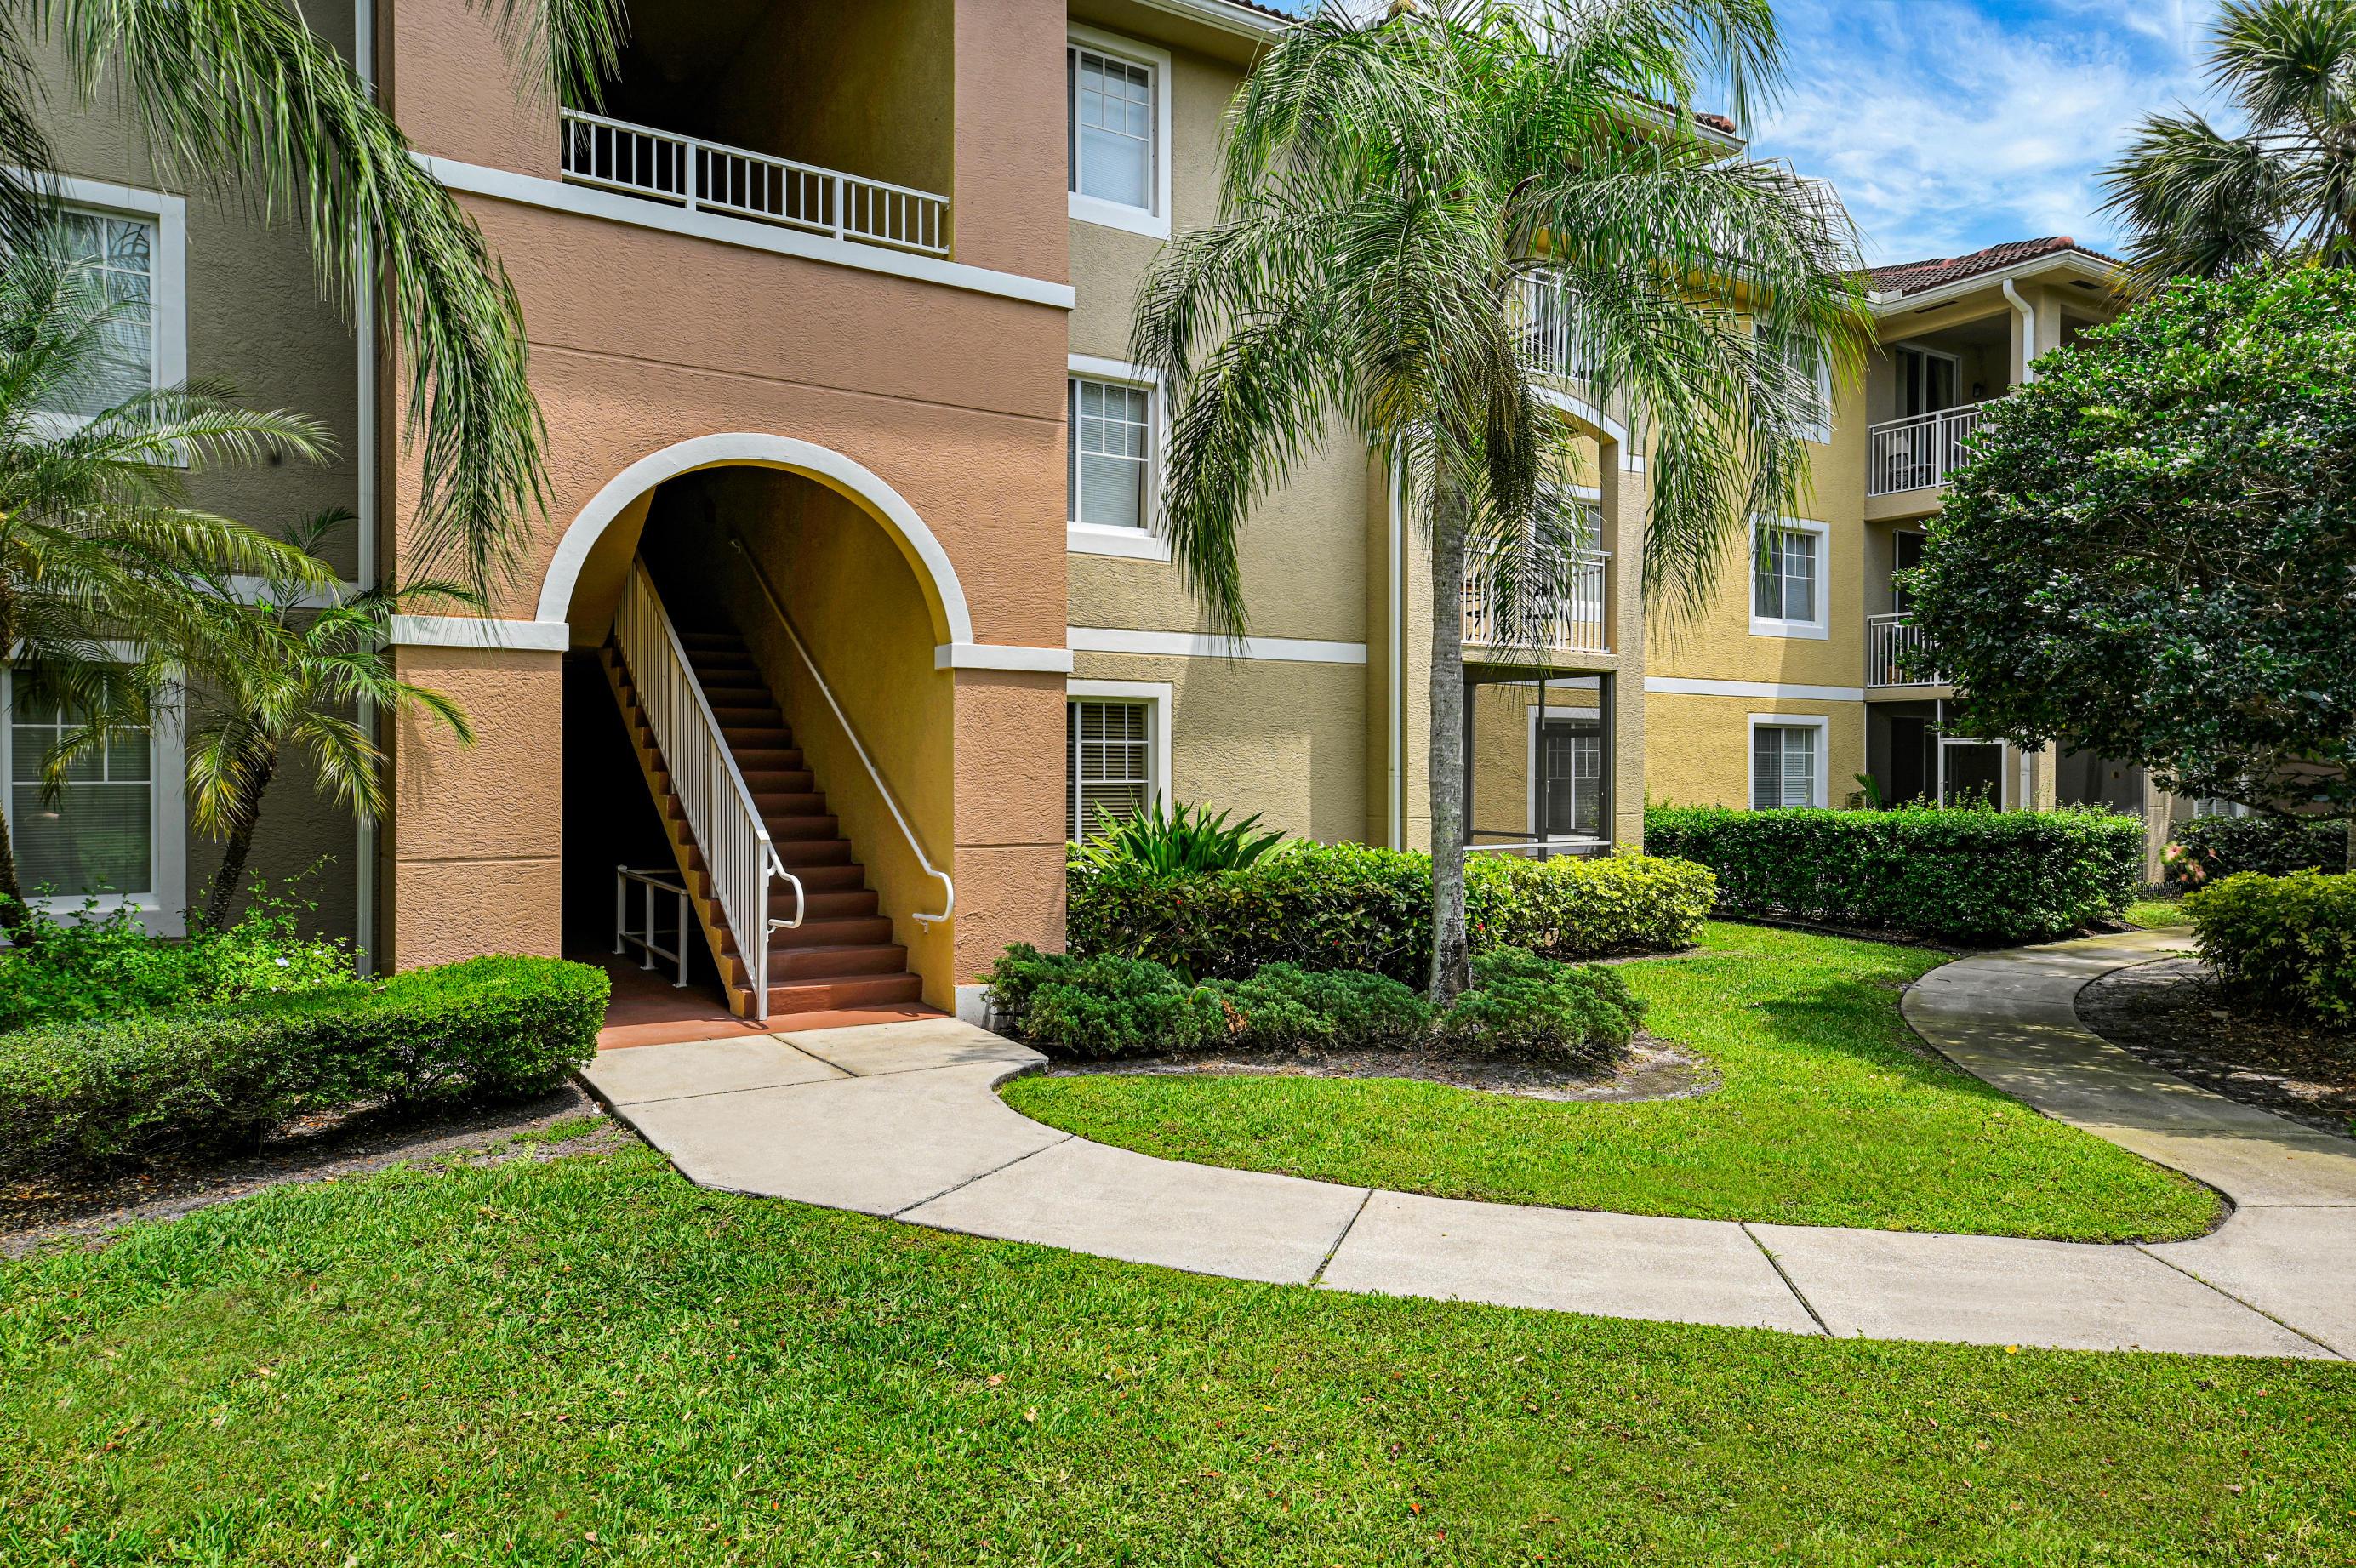 6511  Emerald Dunes Drive 106 For Sale 10709781, FL